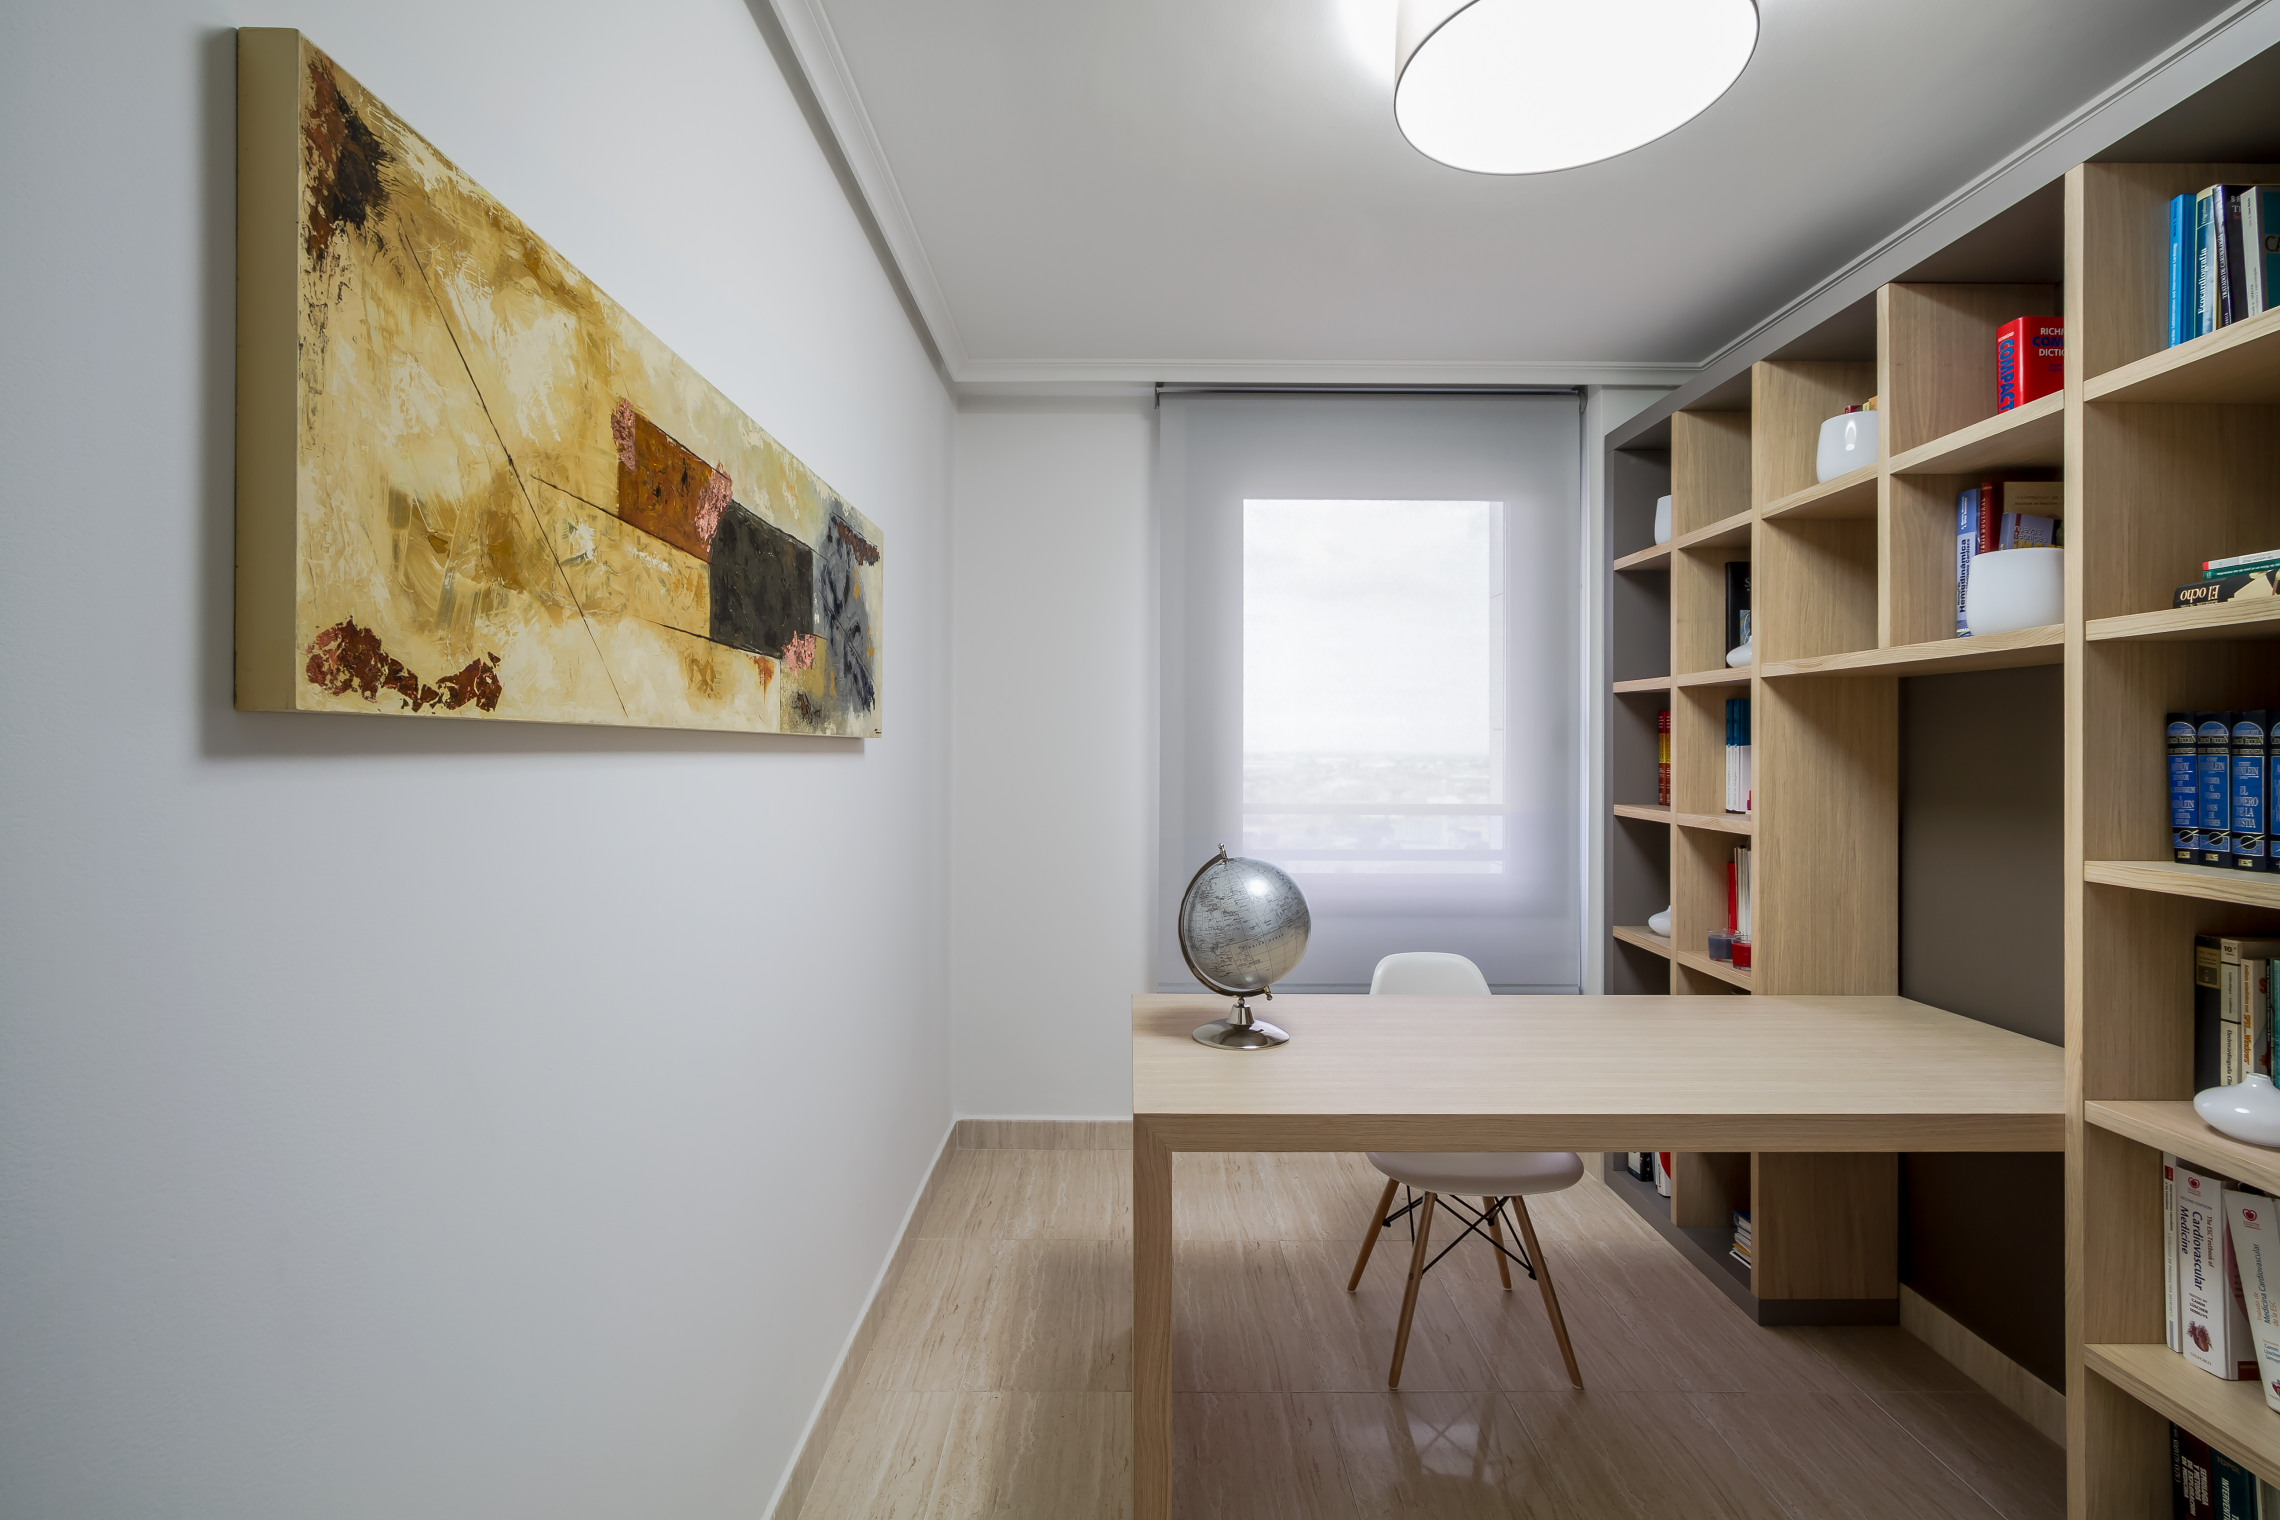 fotografia-arquitectura-valencia-german-cabo-daniela-beaini-atico-ferrandis (7)